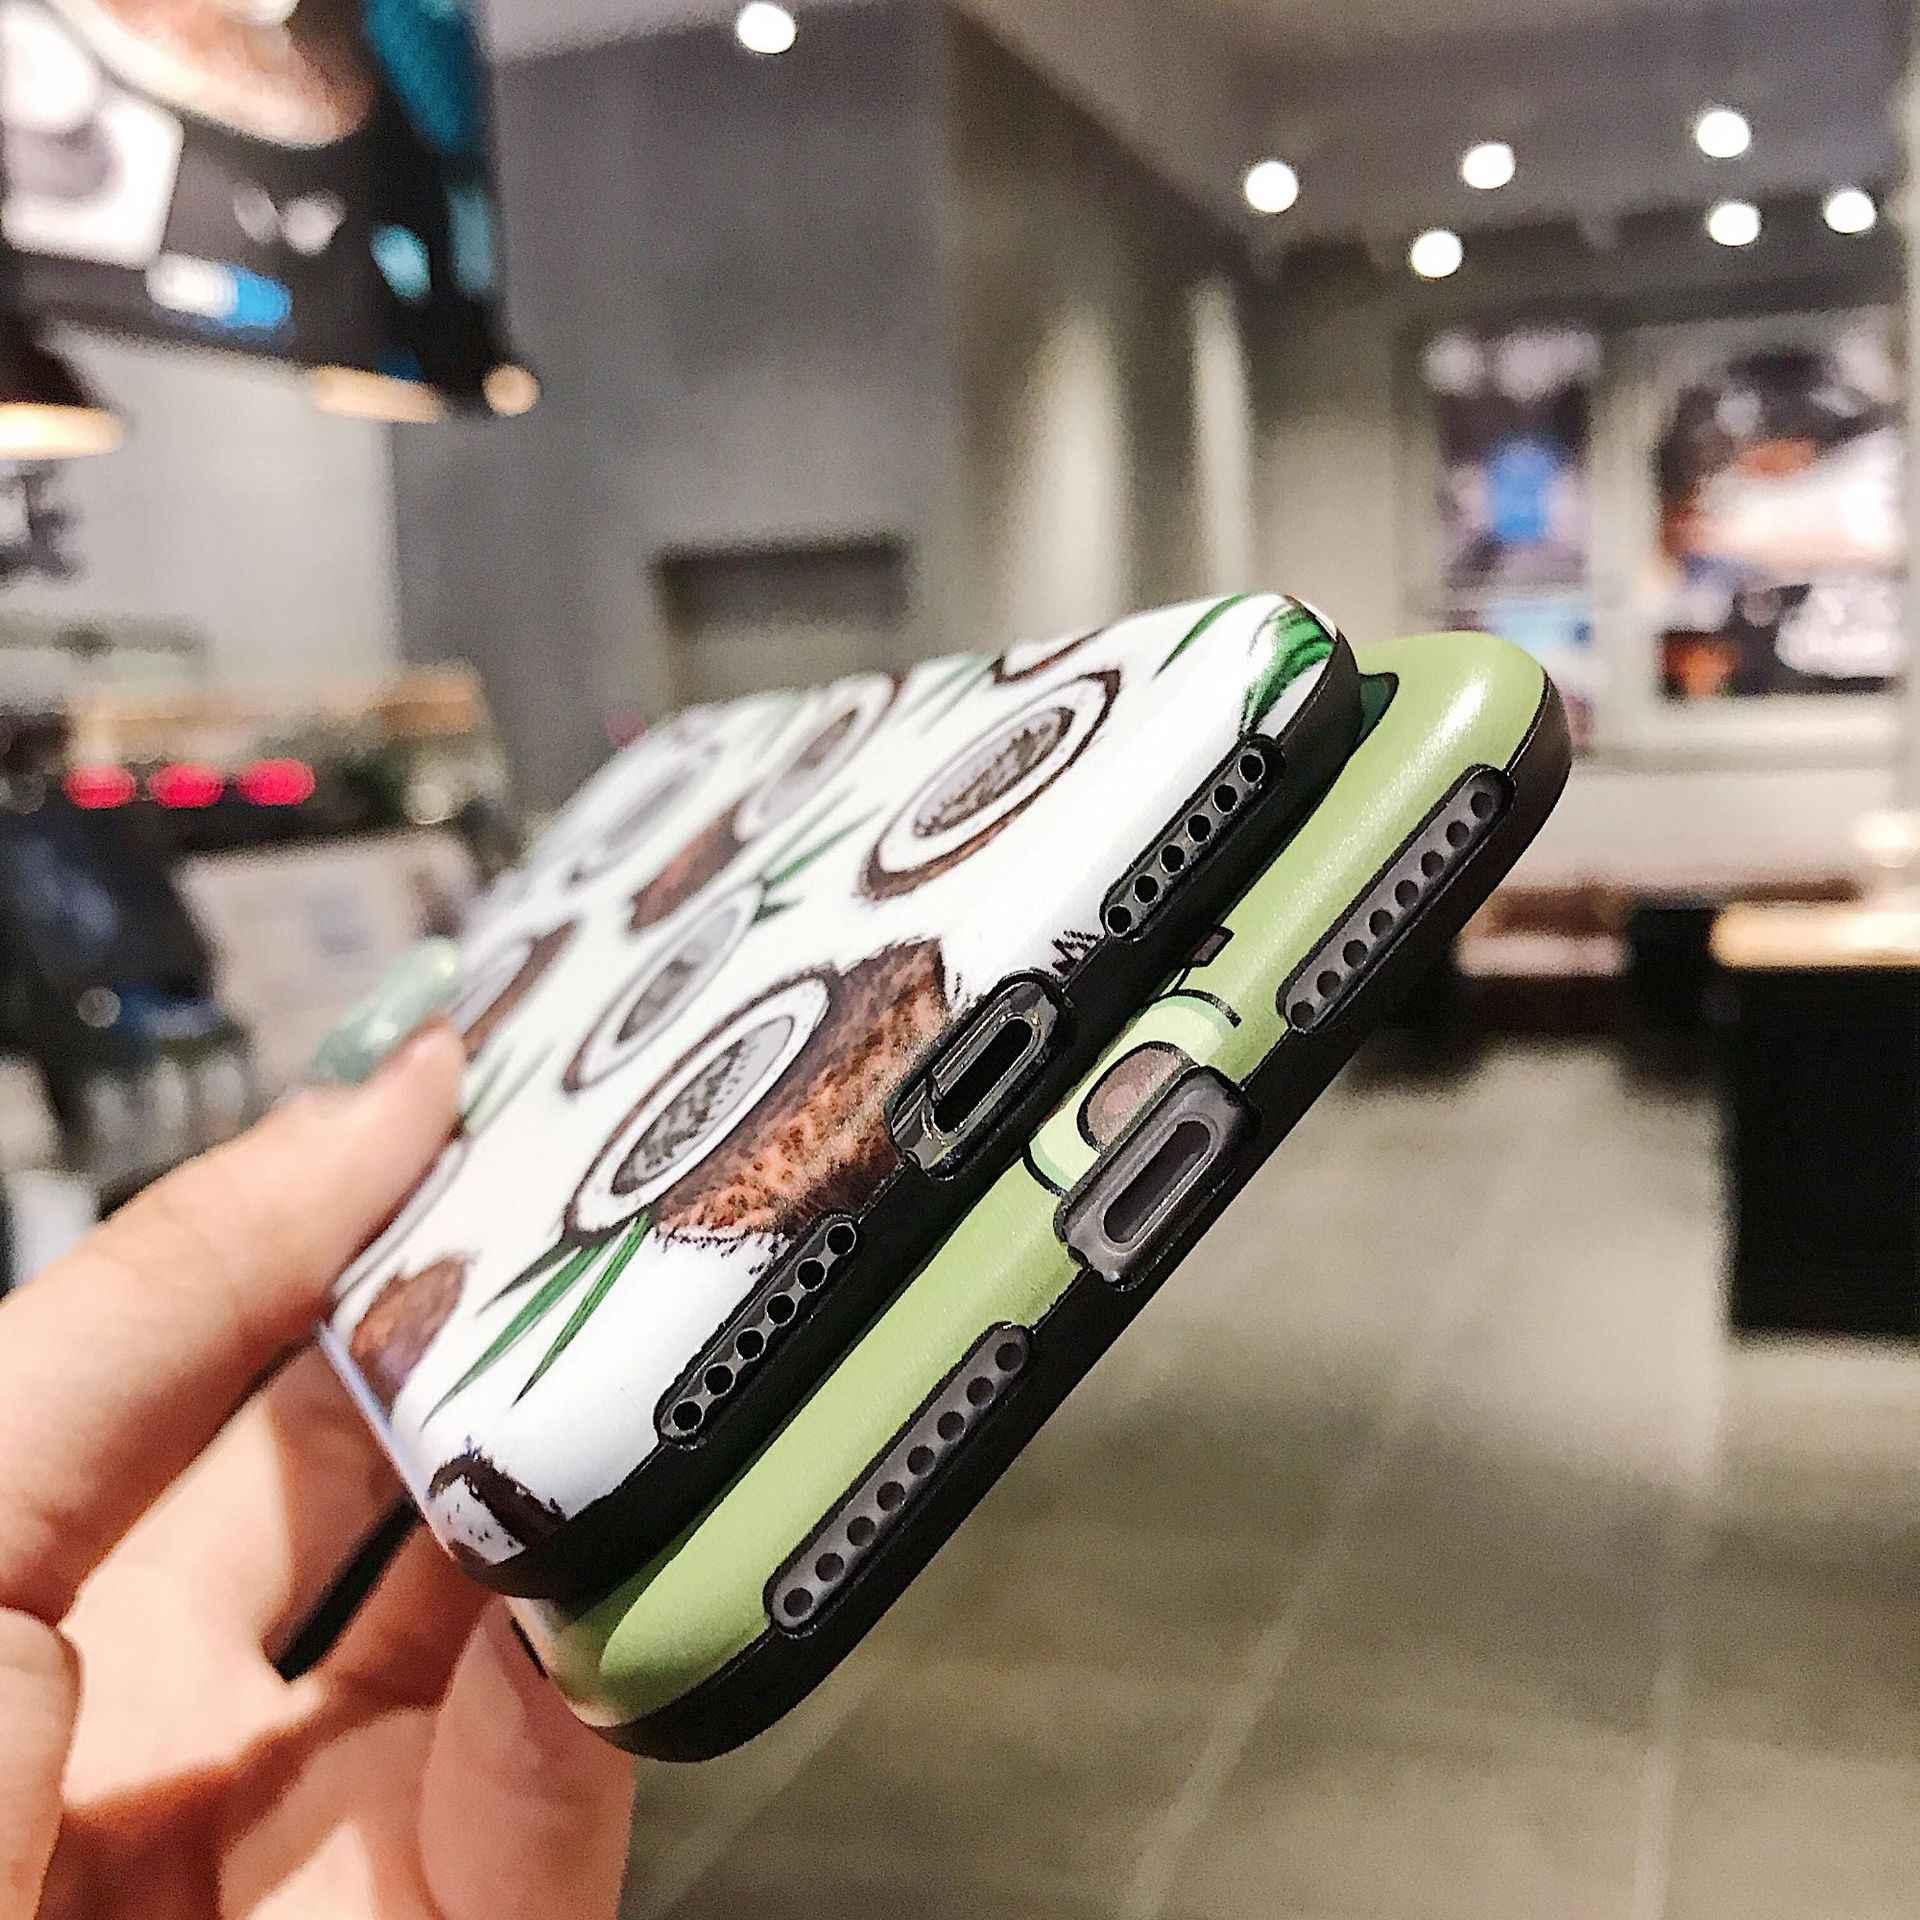 LoliHippo קוקוס אבוקדו רך סיליקון טלפון Case כיסוי אחורי עבור iPhone X 7 8 6 6 S 6 S בתוספת קריקטורה כיסוי עבור iPhone XR XS מקסימום